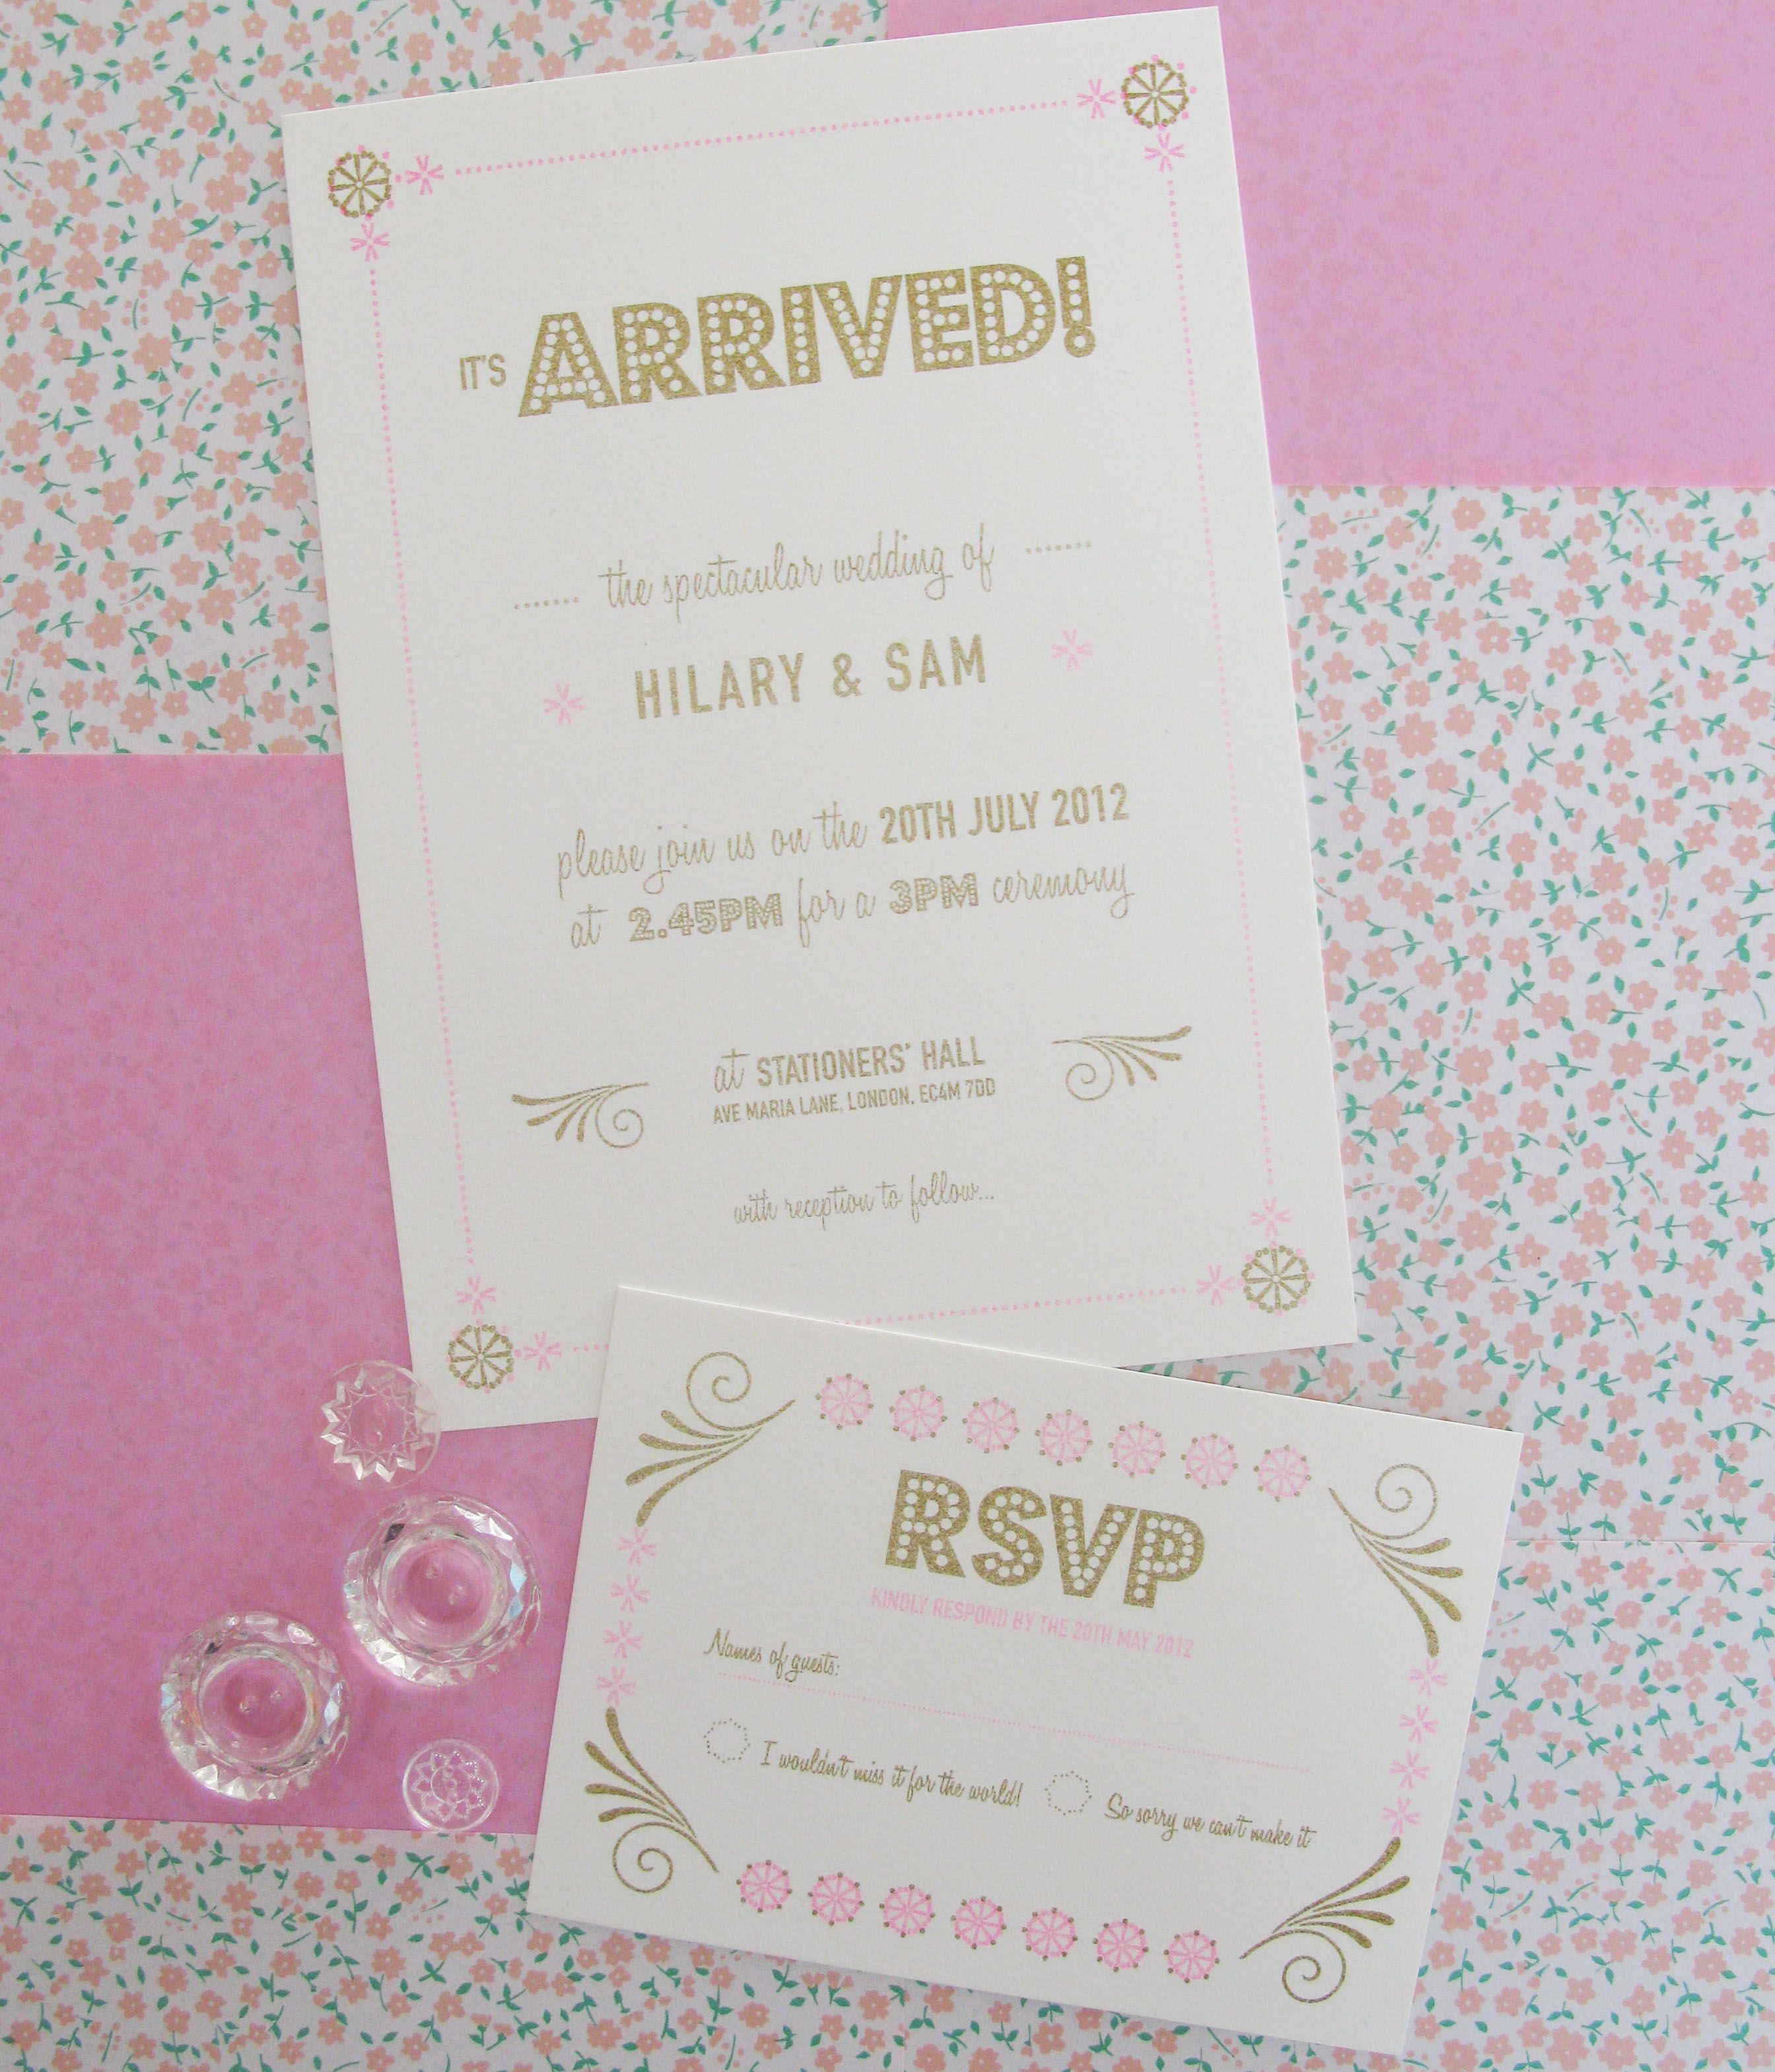 Risograph Printed Wedding Invitation And Rsvp Www.stacksvilledesign.com